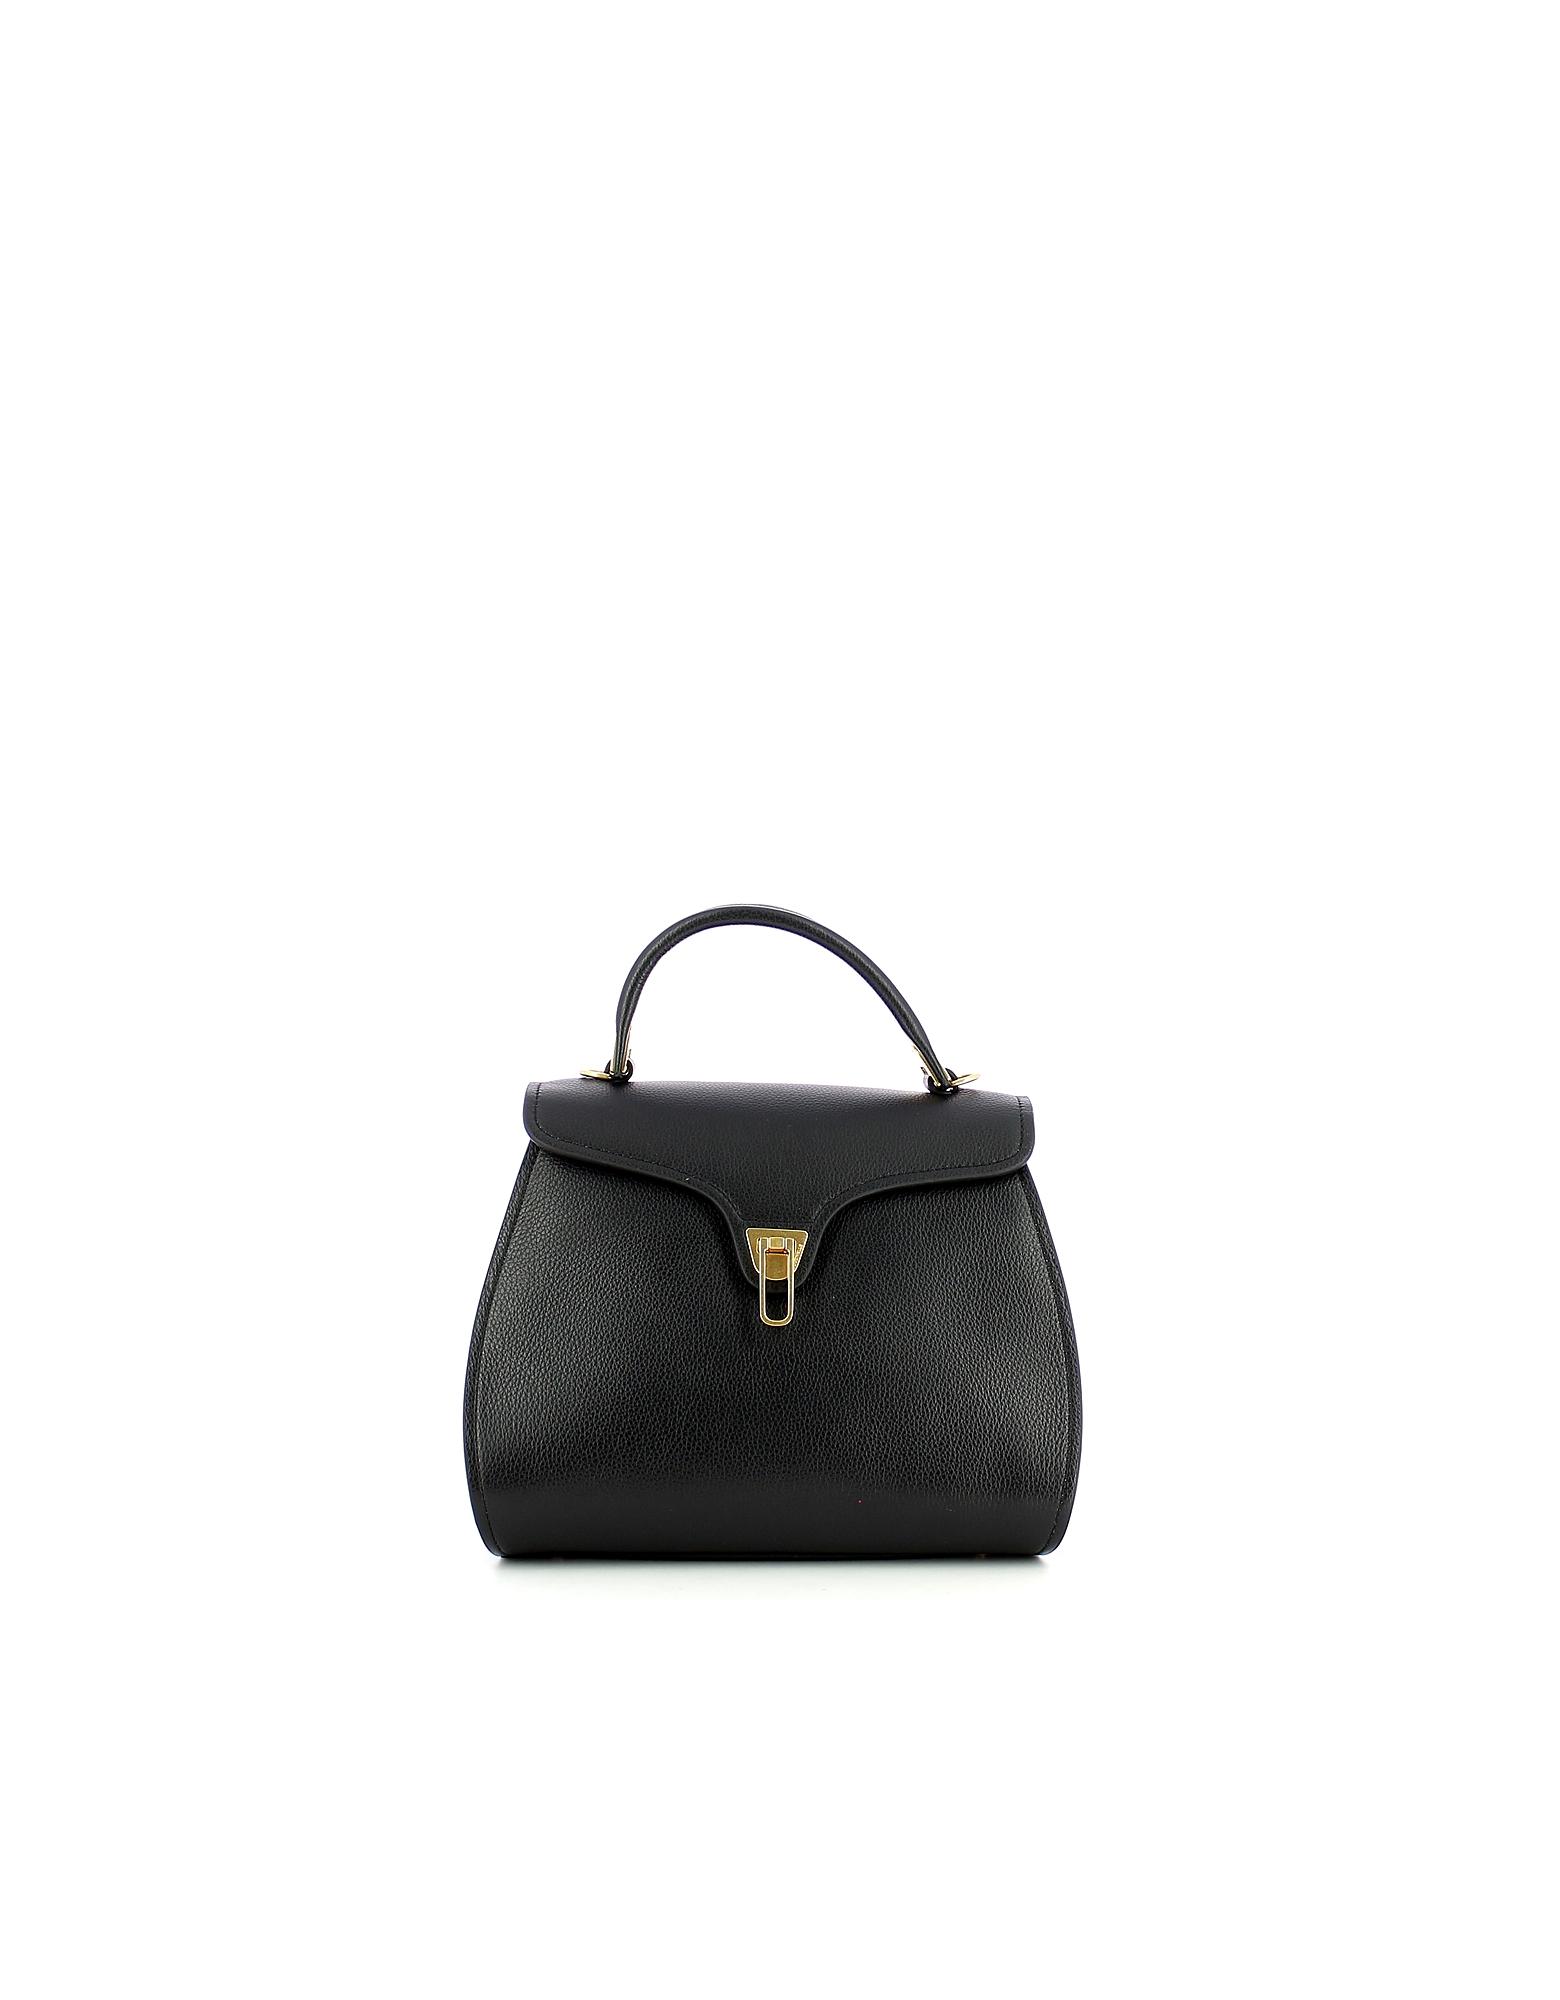 Coccinelle Designer Handbags, Black Marvin Medium Top Handle Satchel Bag